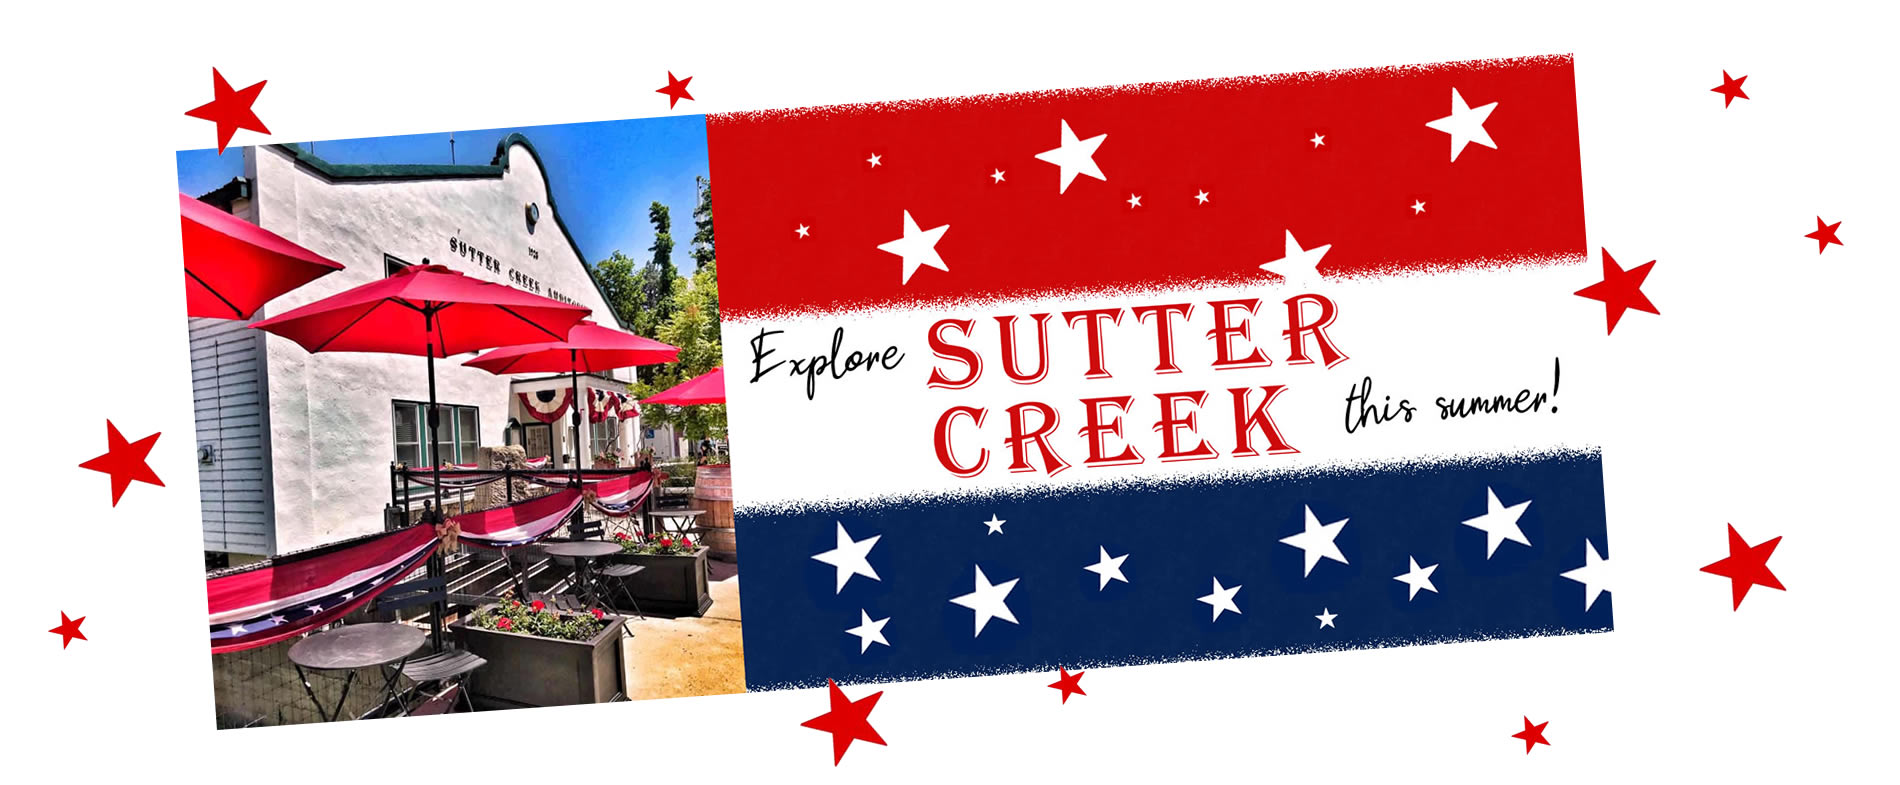 explore sutter creek this summer